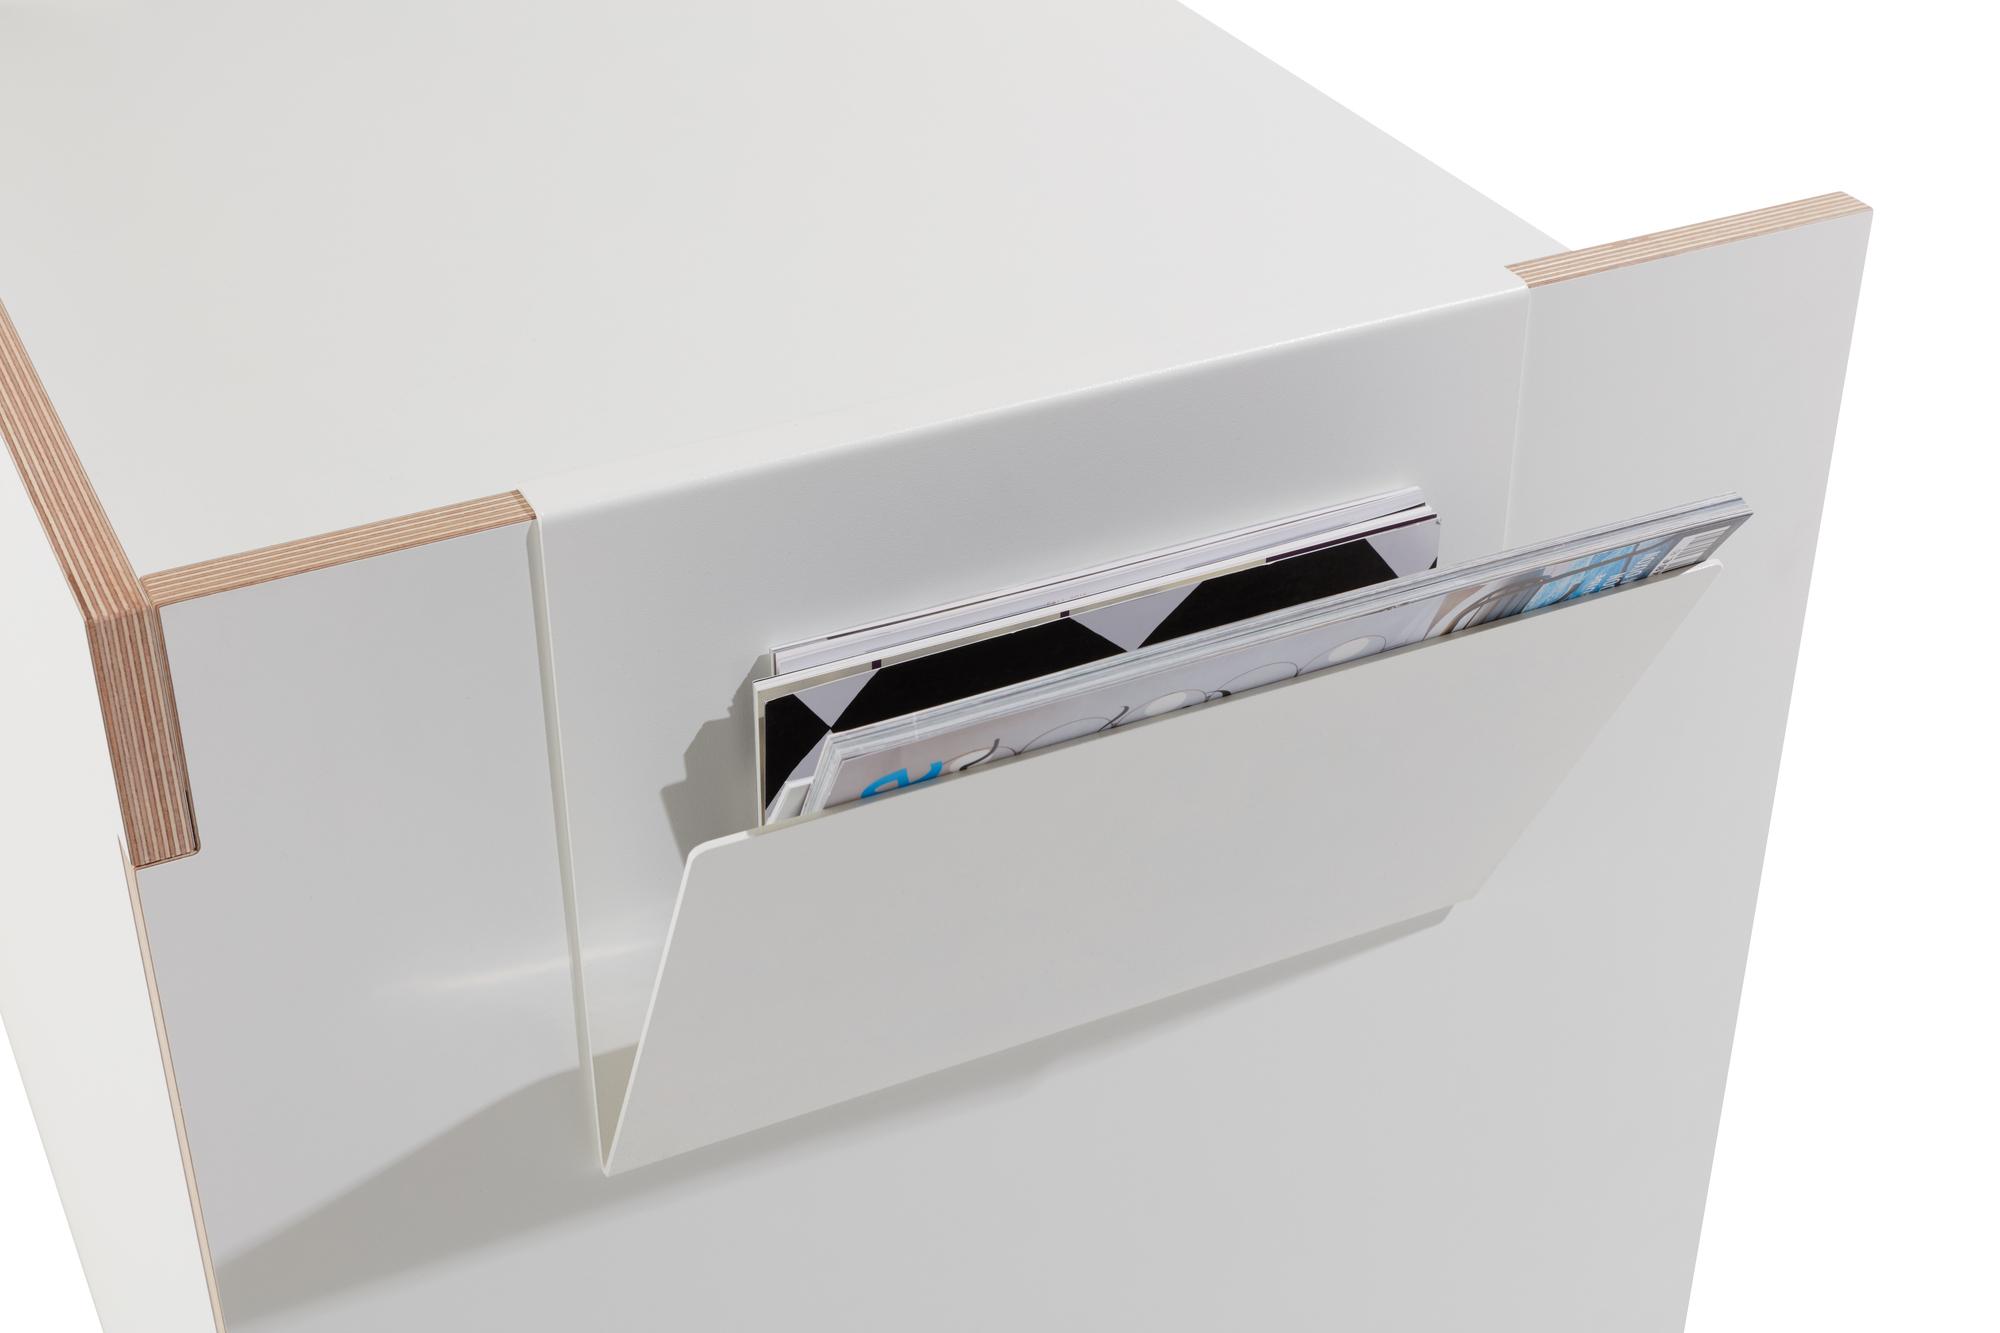 Flai Accessories Secretary Müller Möbelwerkstätten Mirror